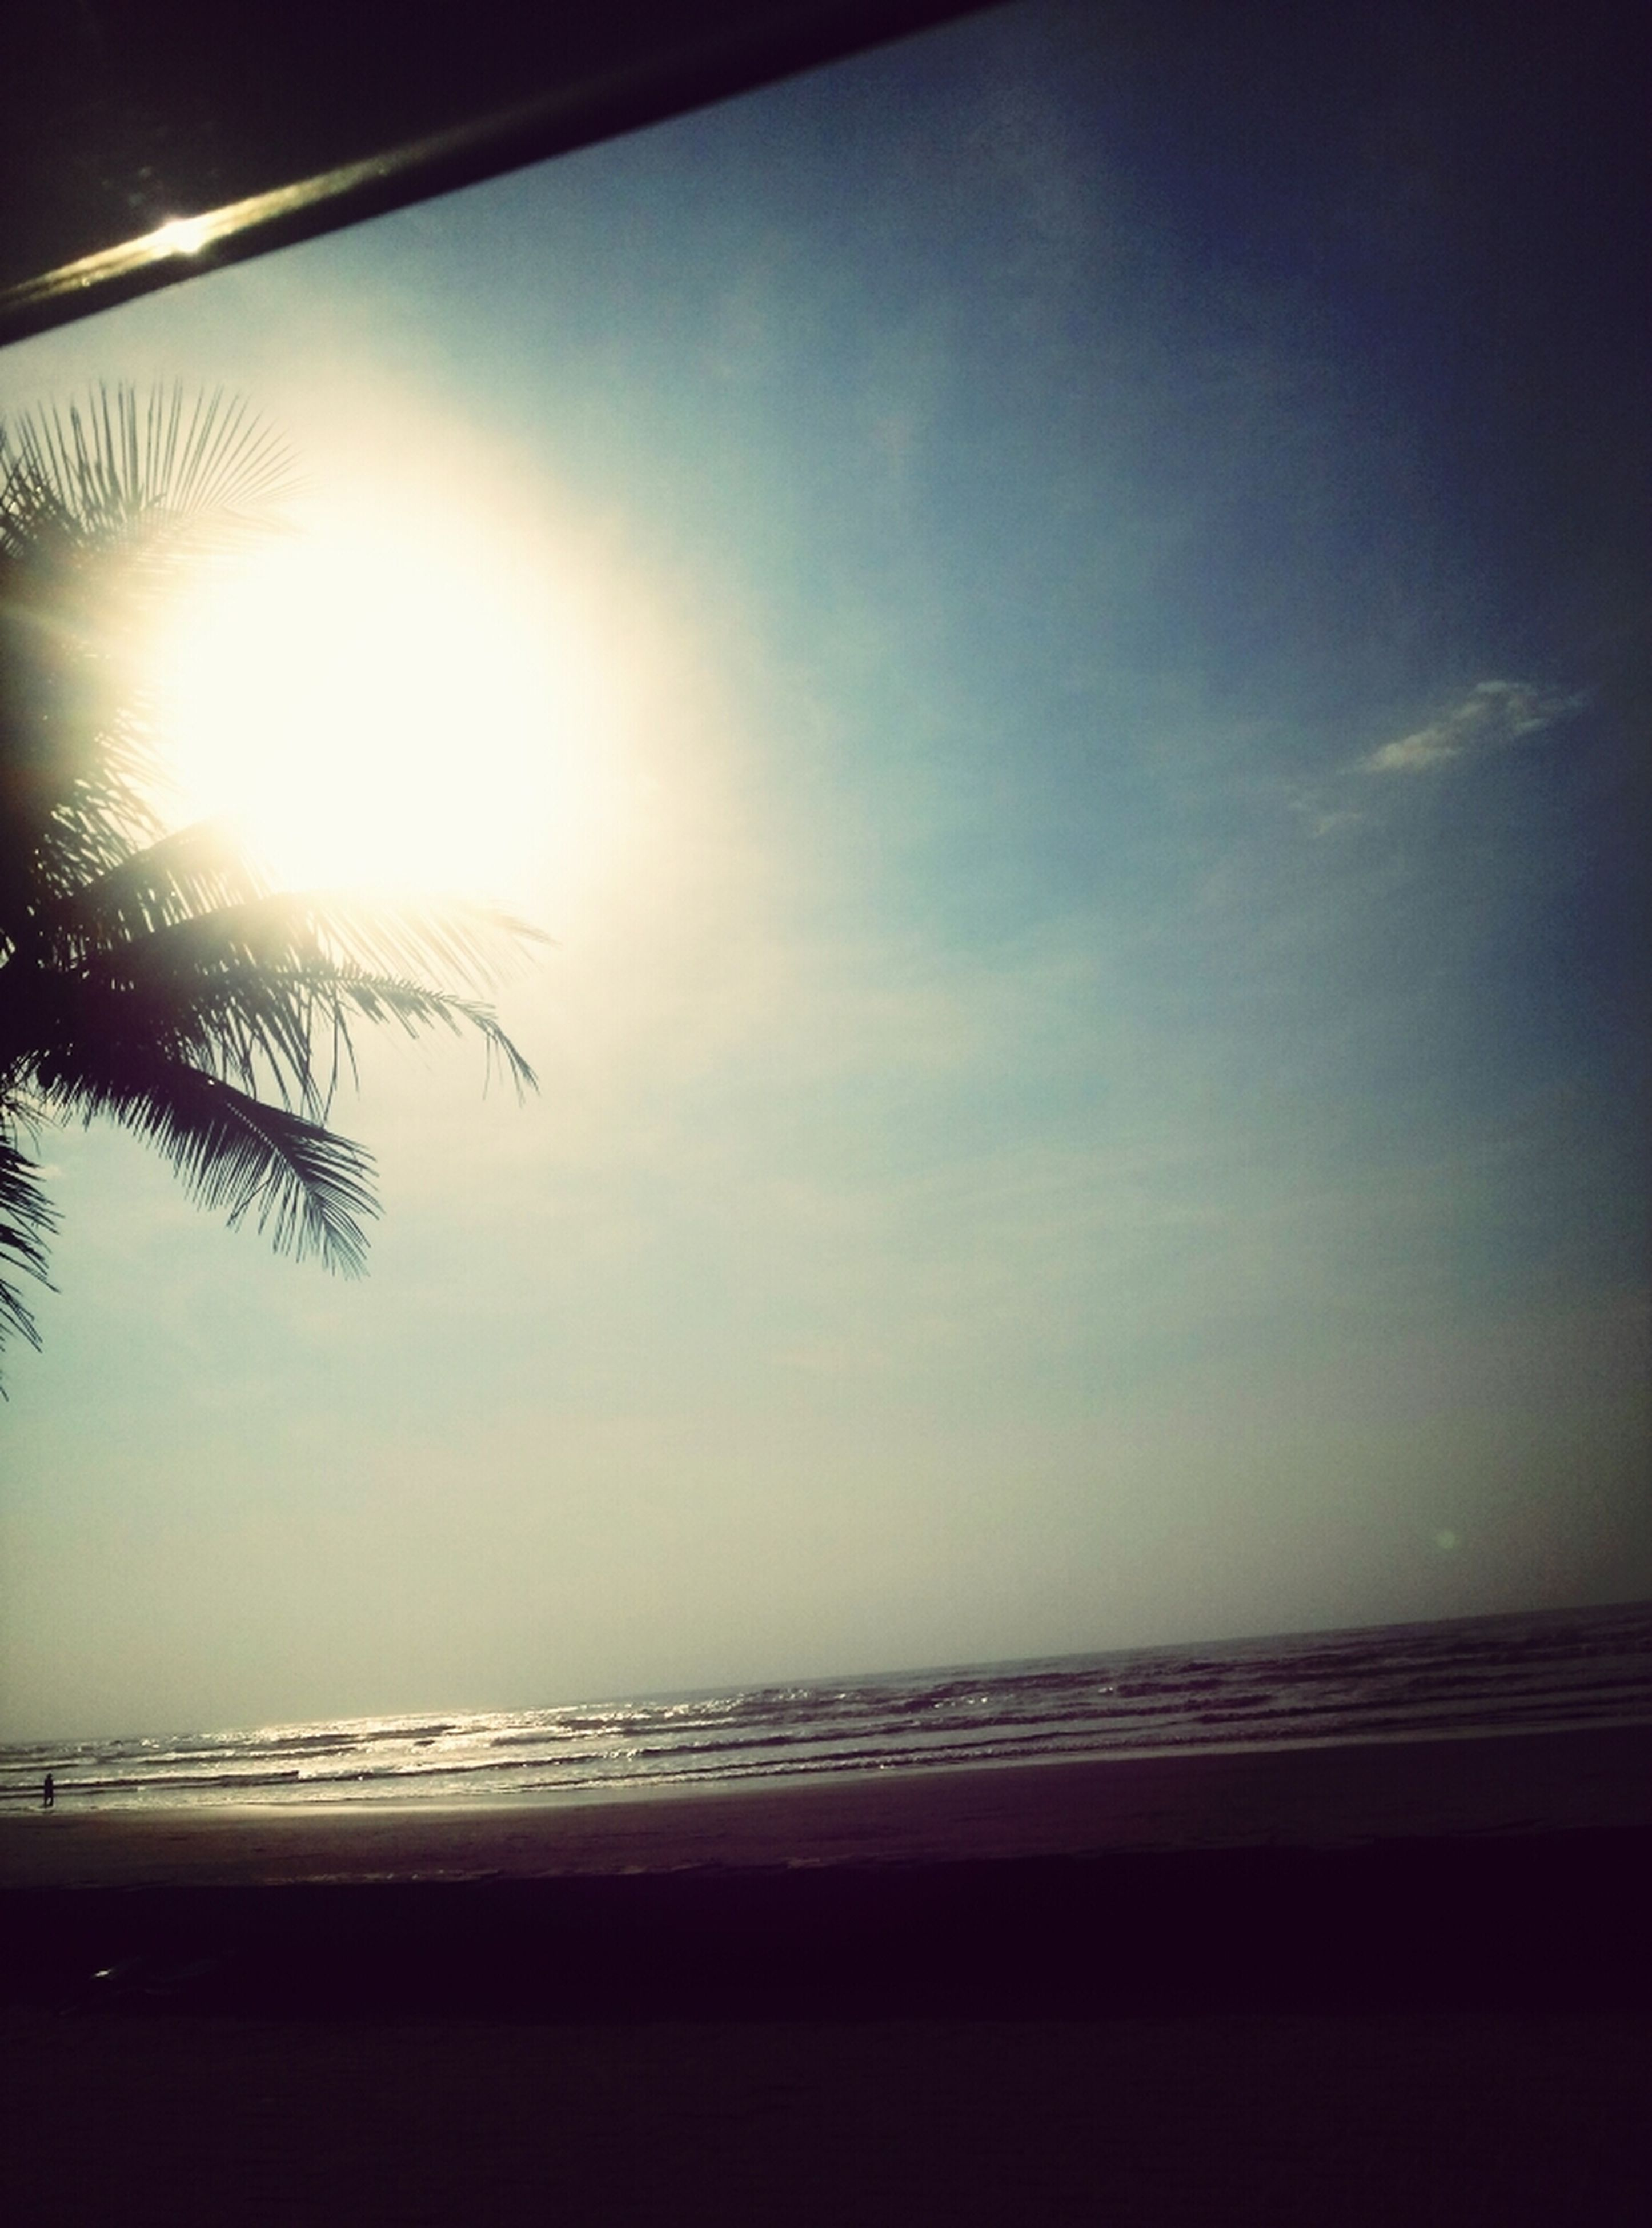 horizon over water, sea, beach, tranquil scene, tranquility, sun, scenics, water, sky, shore, sunset, beauty in nature, silhouette, nature, sand, sunlight, idyllic, sunbeam, calm, cloud - sky